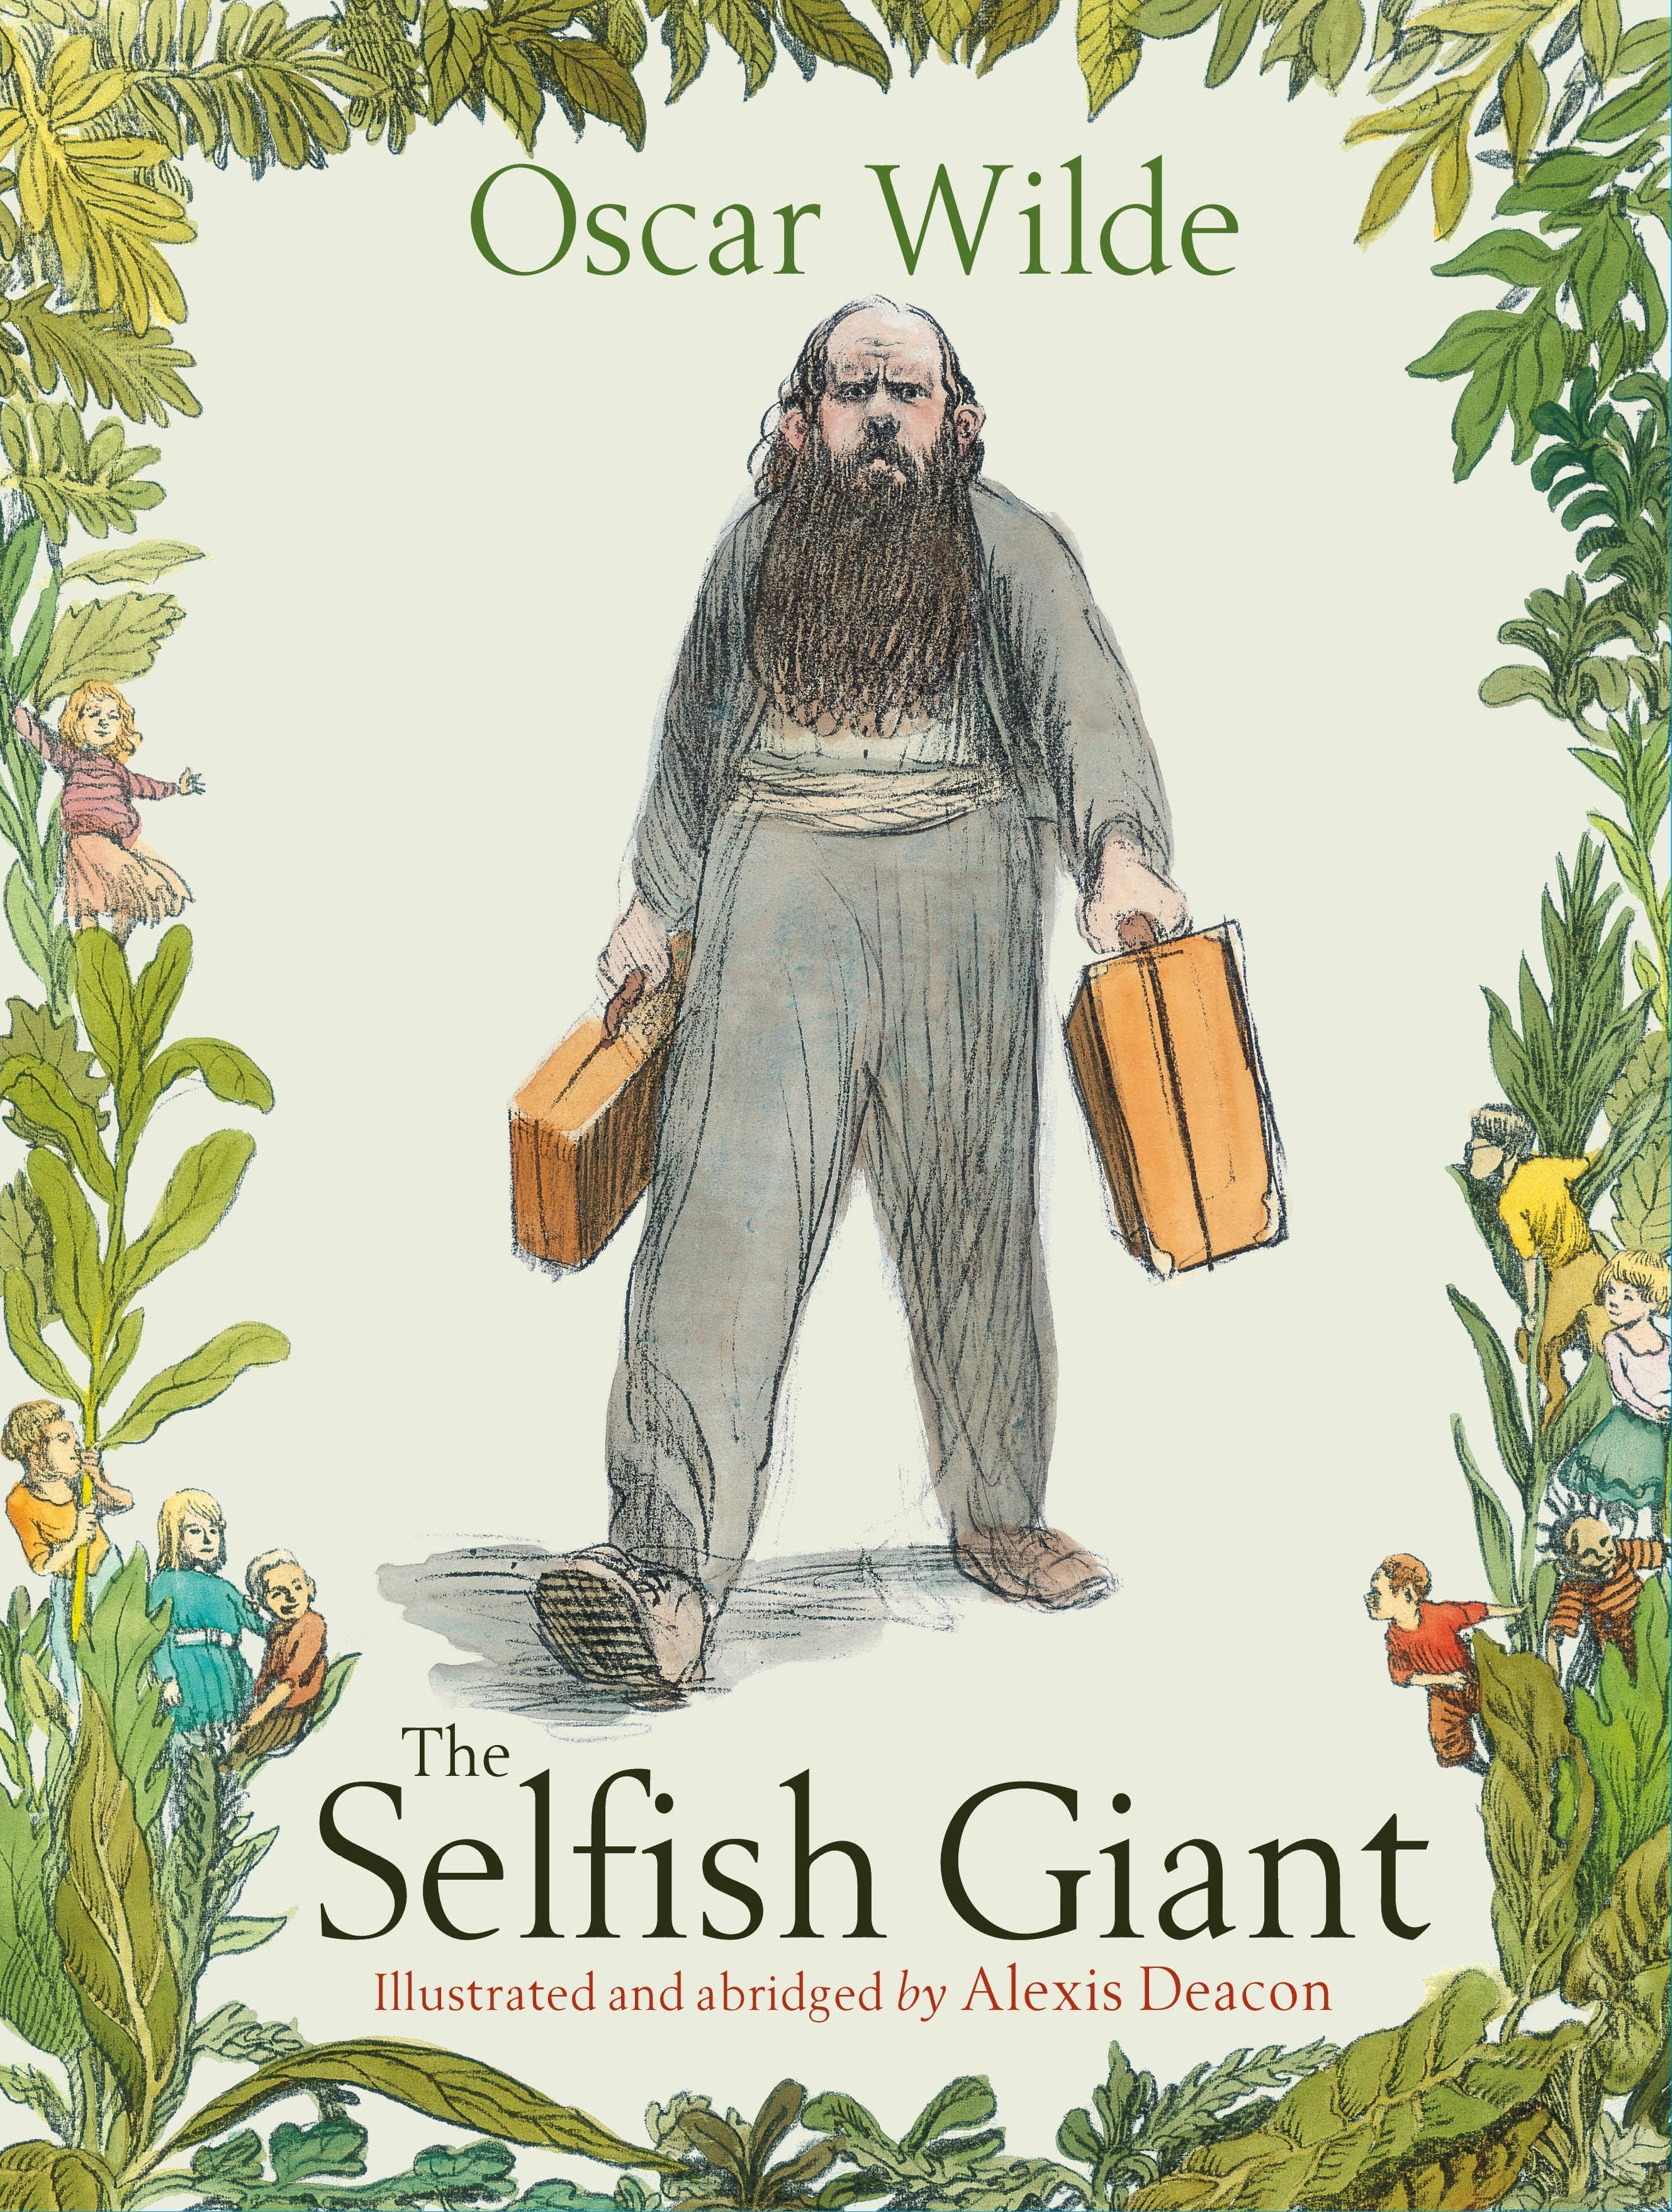 The Selfish Giant by Oscar Wilde - Penguin Books Australia